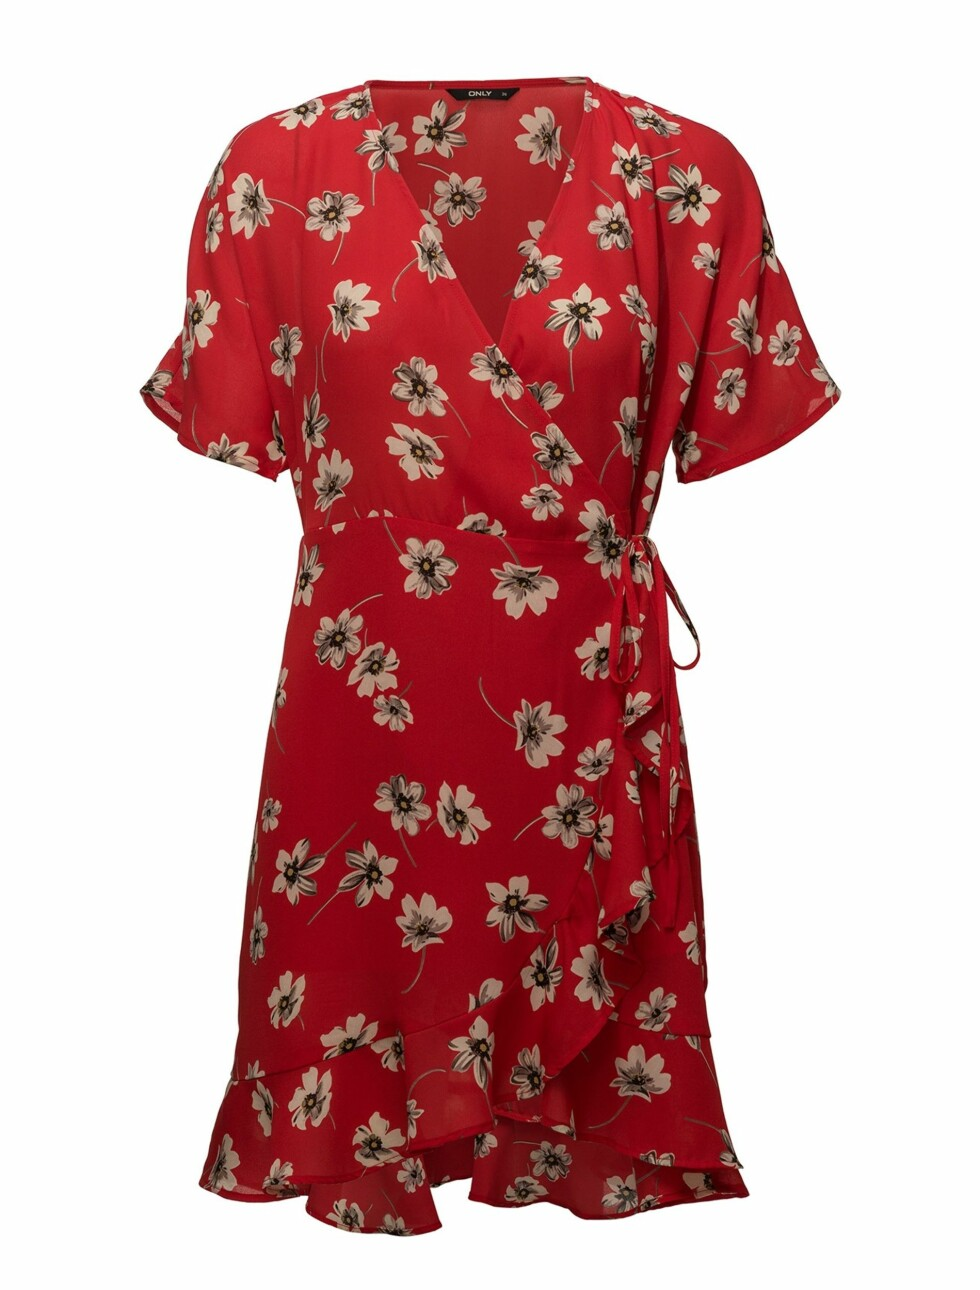 Kjole fra Only  280,-  https://www.boozt.com/no/no/only/onljenifer-s-s-wrap-dress-wvn_17850466/17850473?navId=67453&group=listing&position=1000000